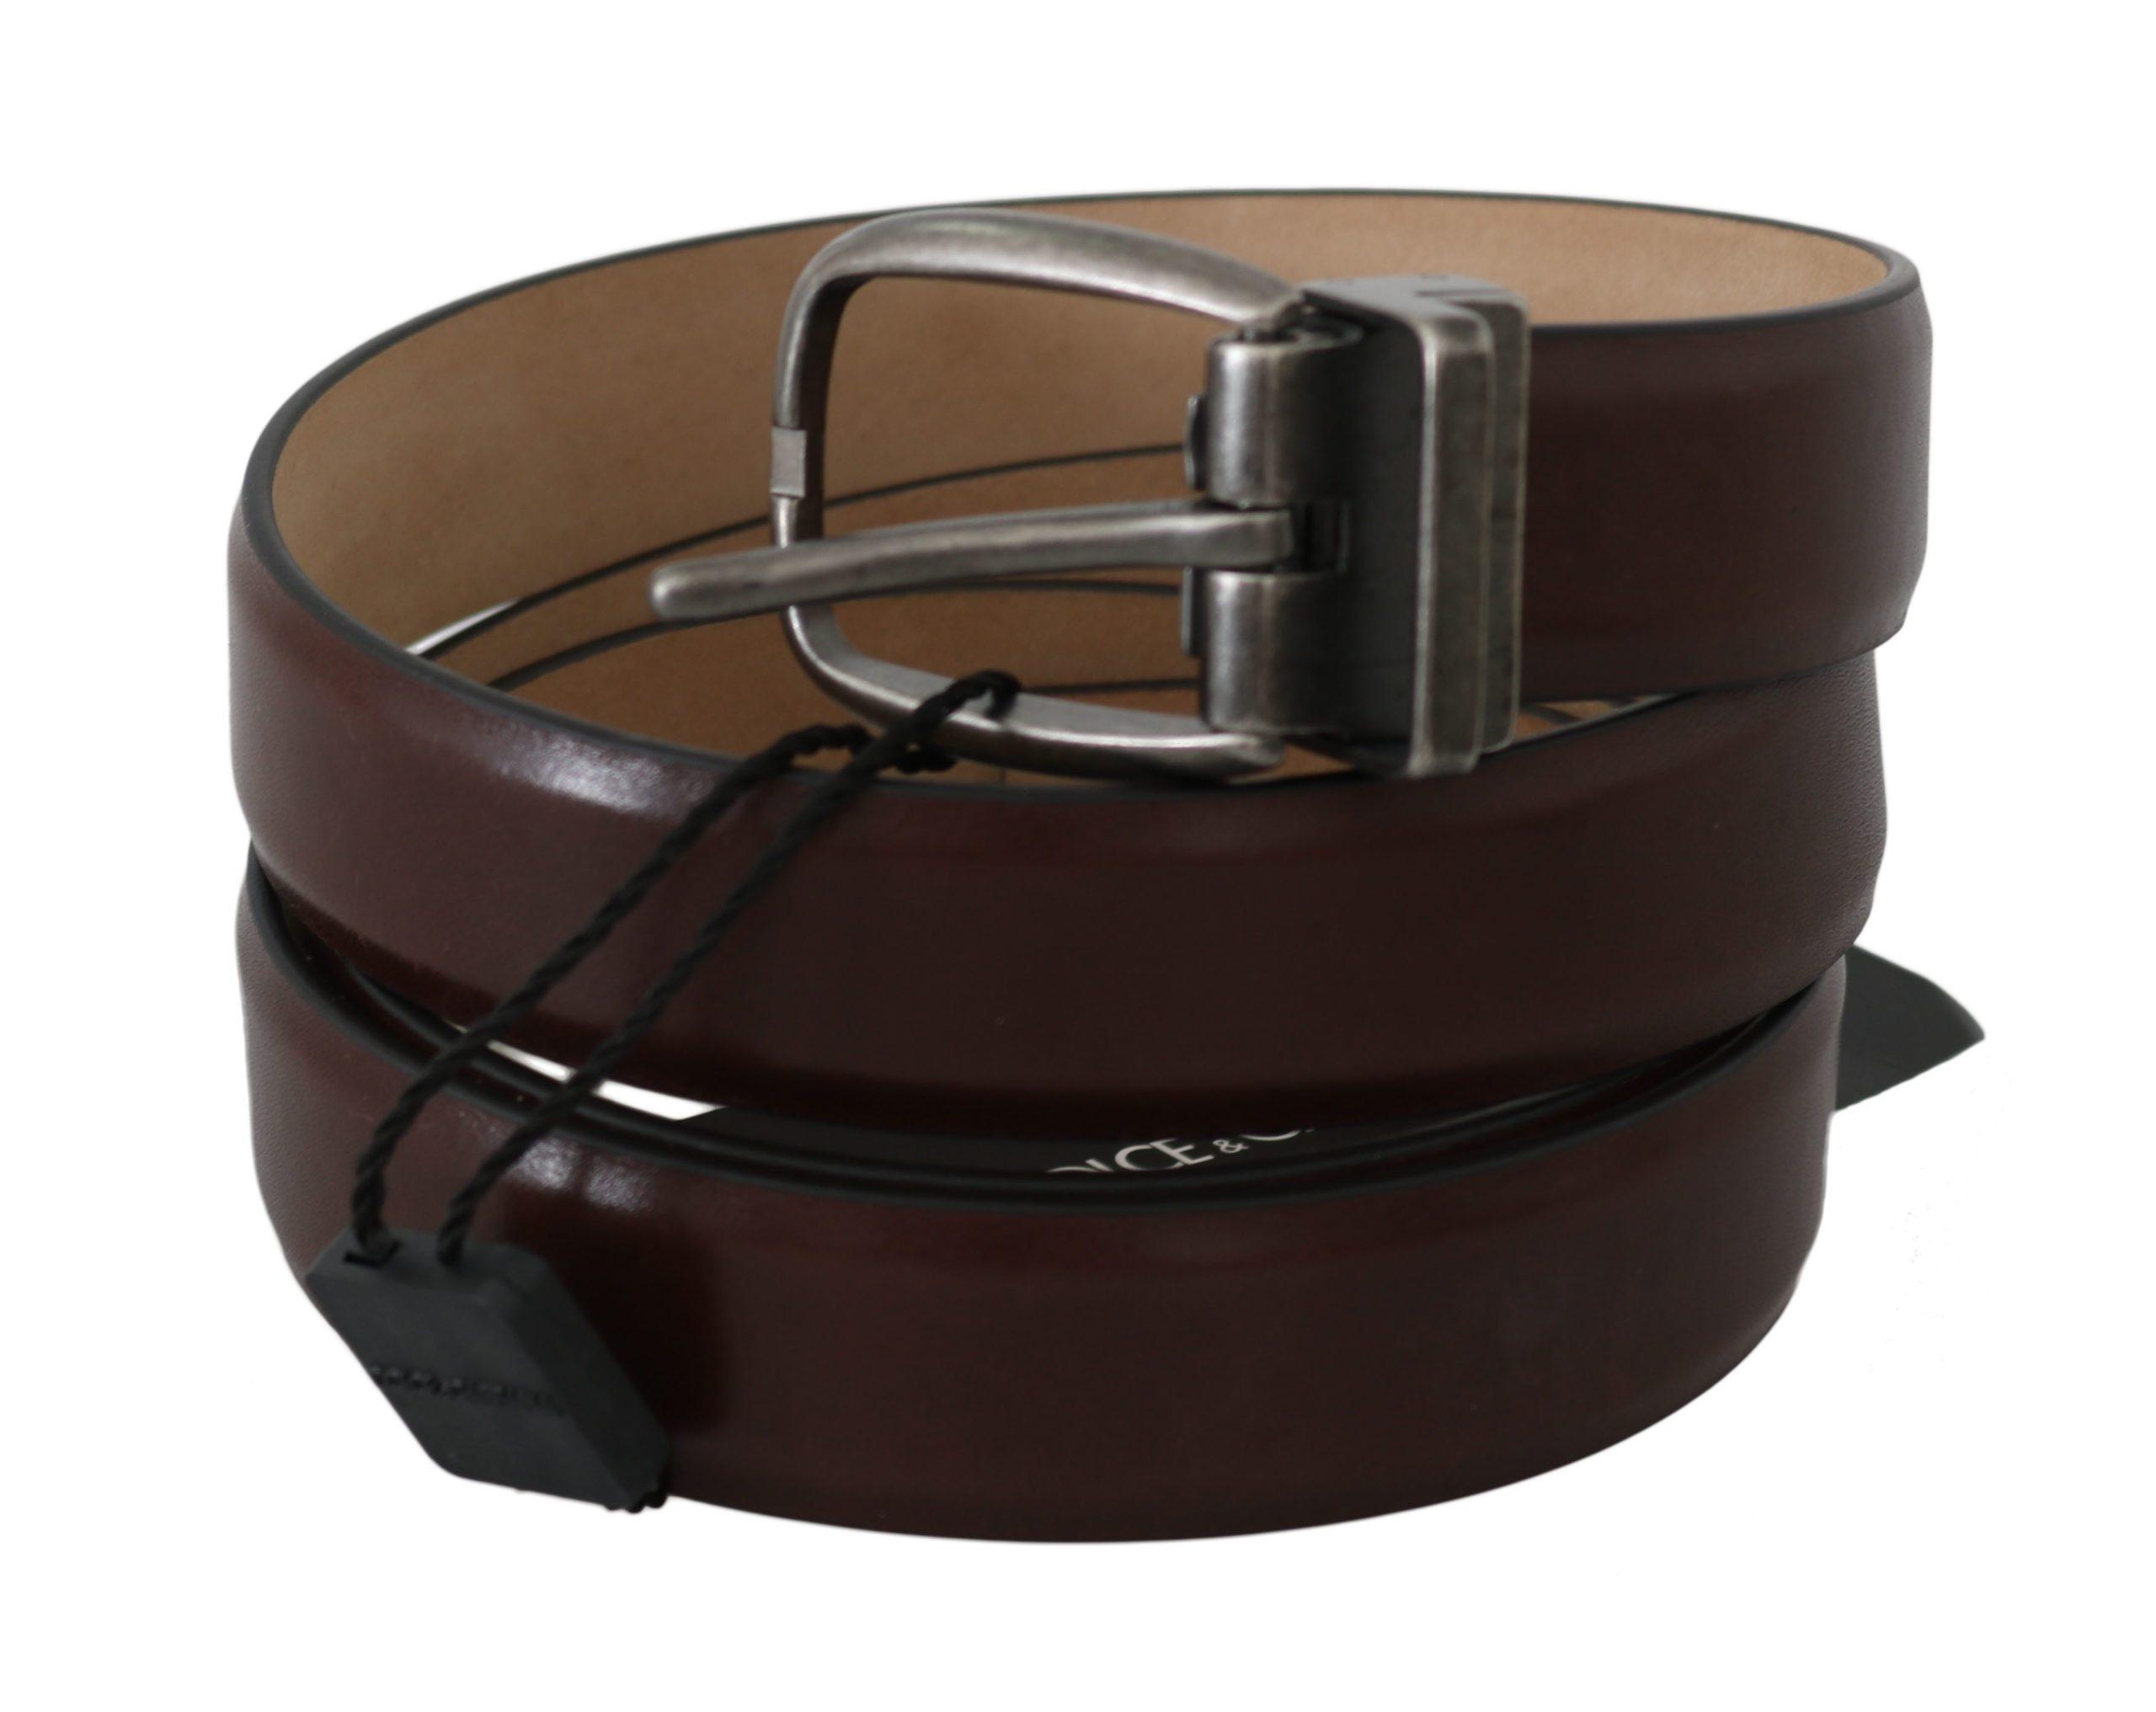 Dolce & Gabbana Women's Calfskin Leather Buckle Belt Brown BEL60333 - 100 cm / 40 Inches